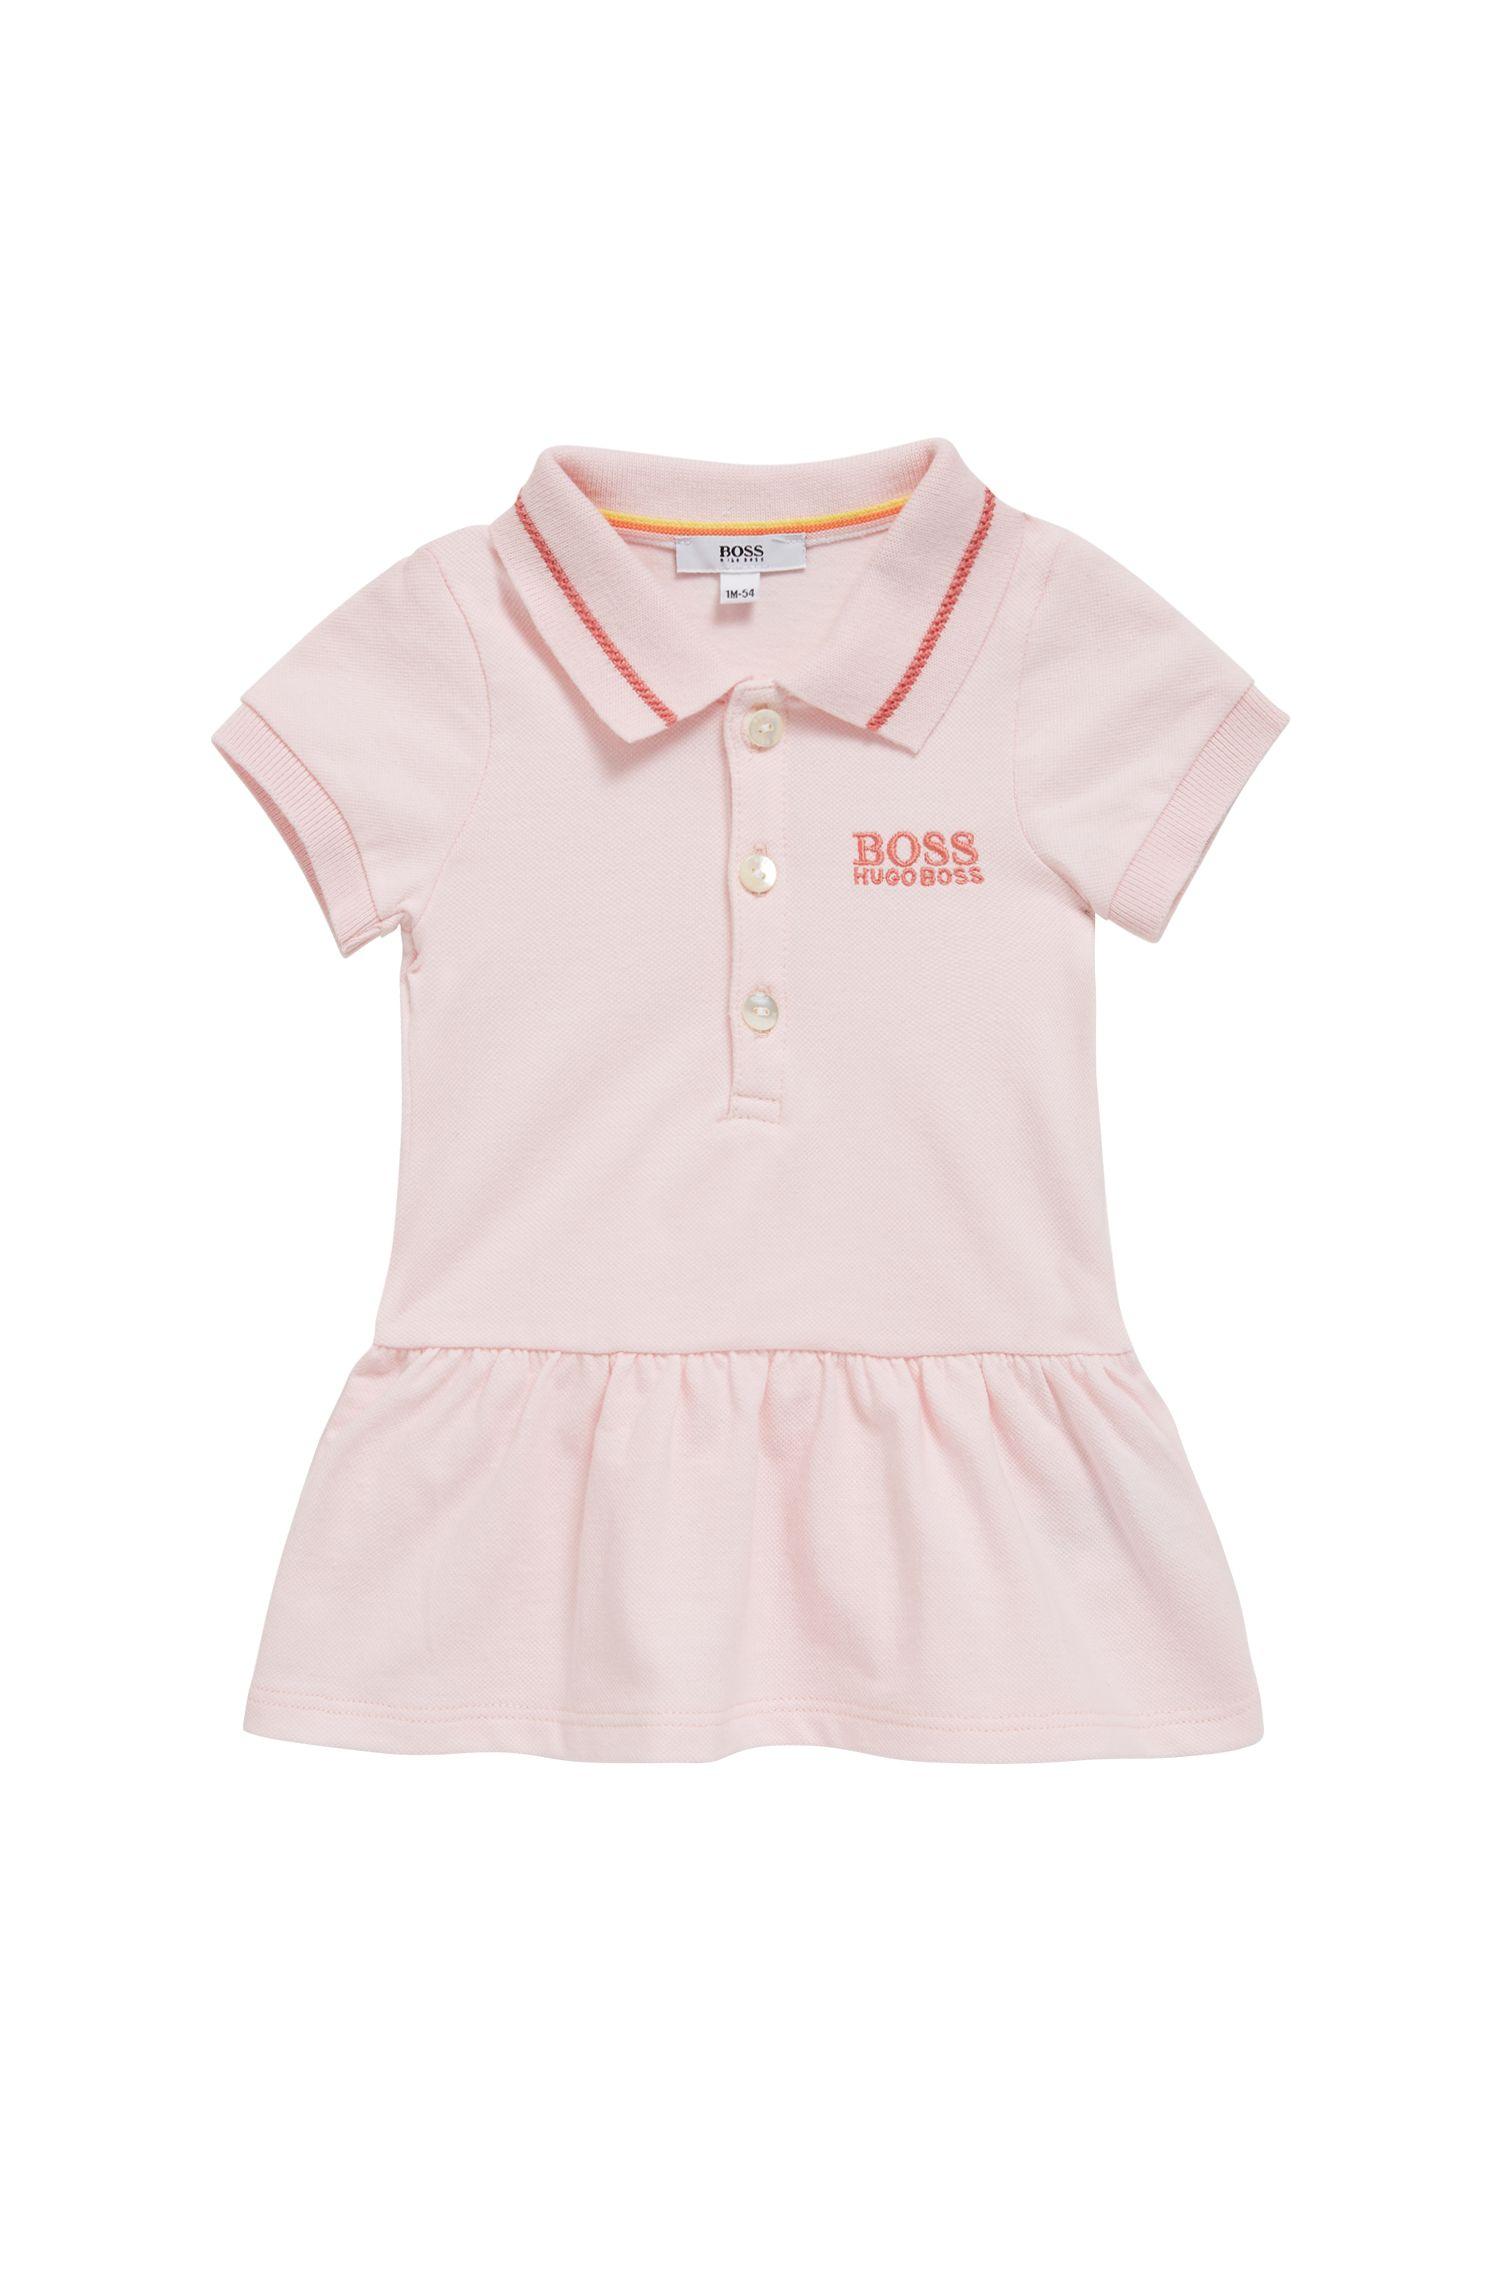 Hugo Boss - Robe de tennis pour bébé en piqué de coton stretch - 1